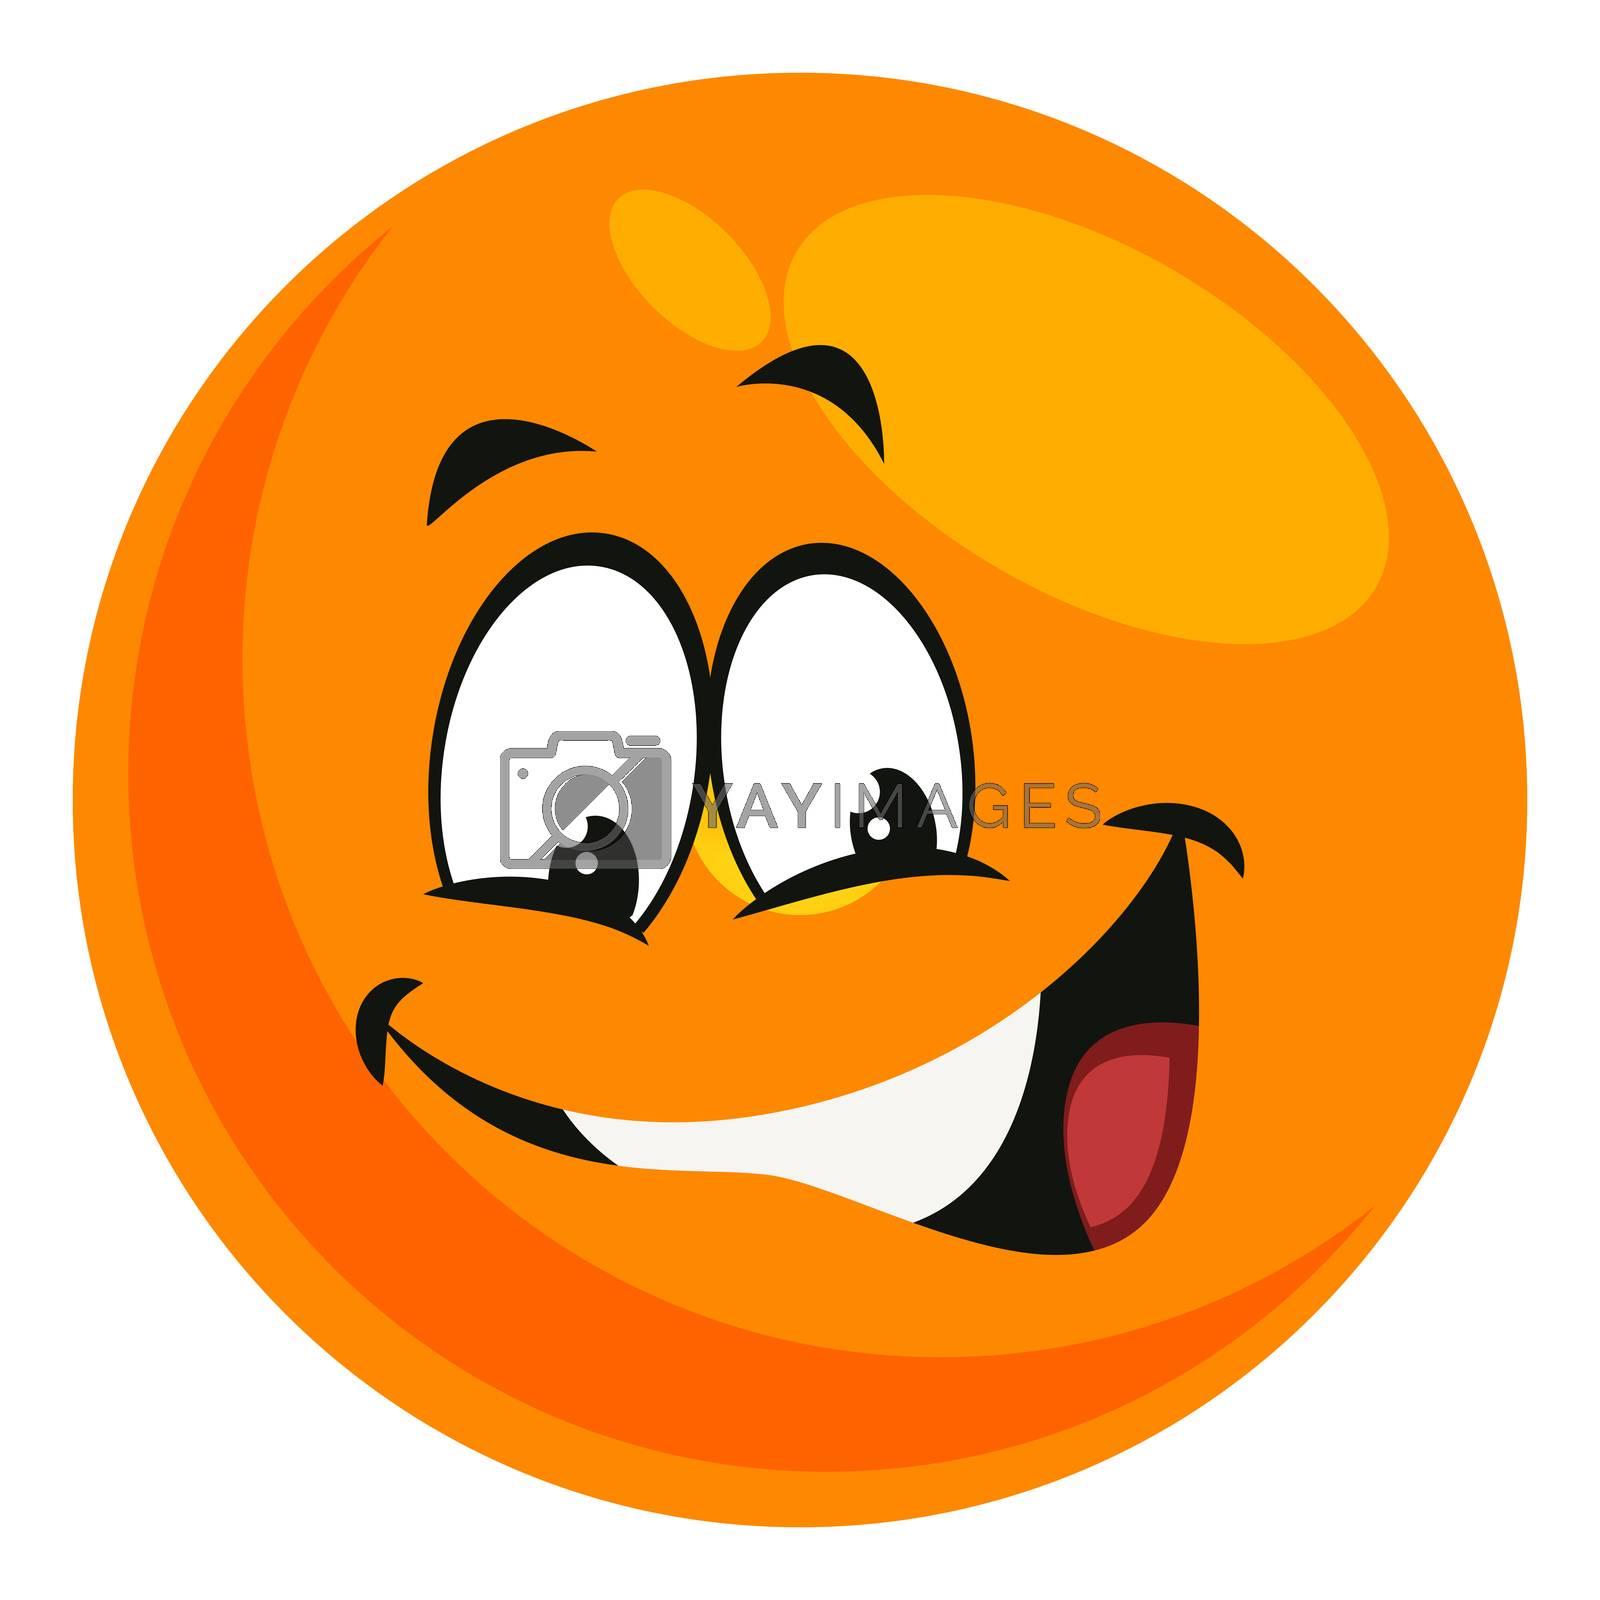 Smiling emoji, illustration, vector on white background